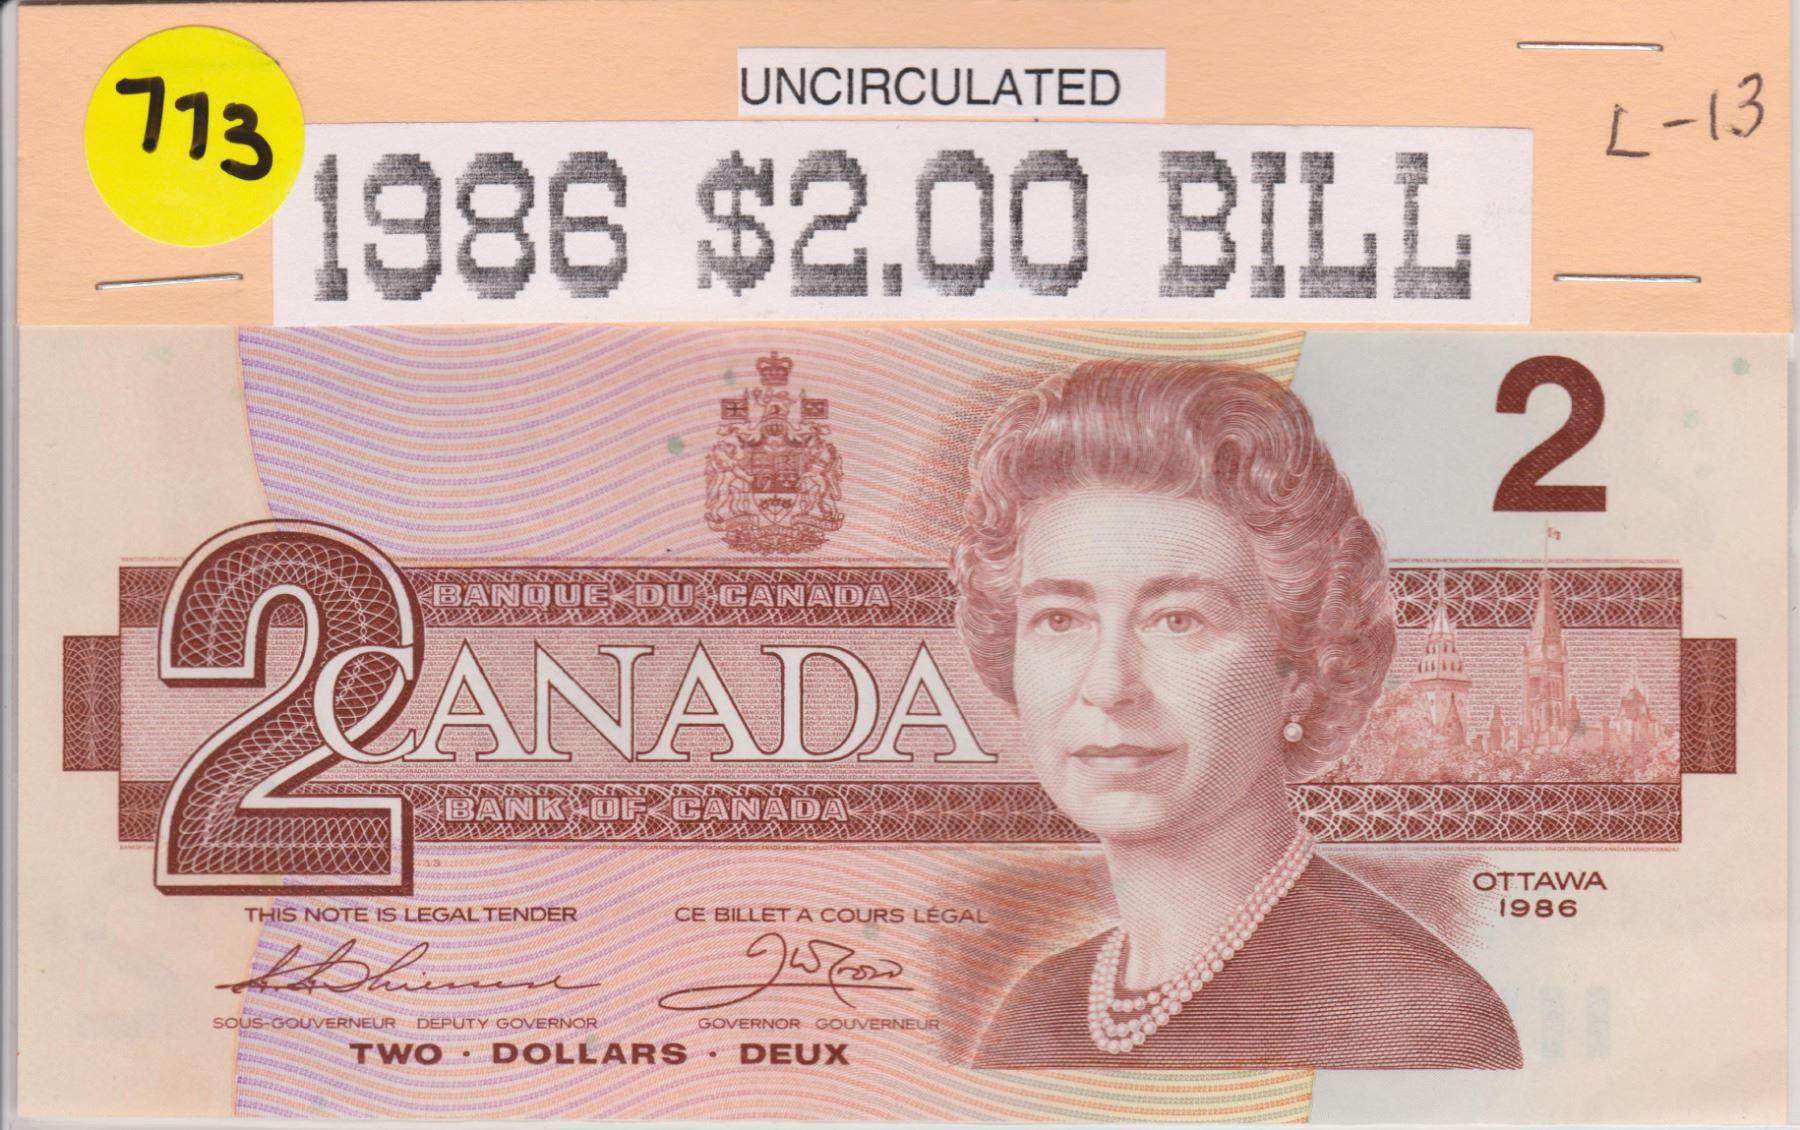 1986 CNDN 2 DOLLAR BILL, UNCIRC